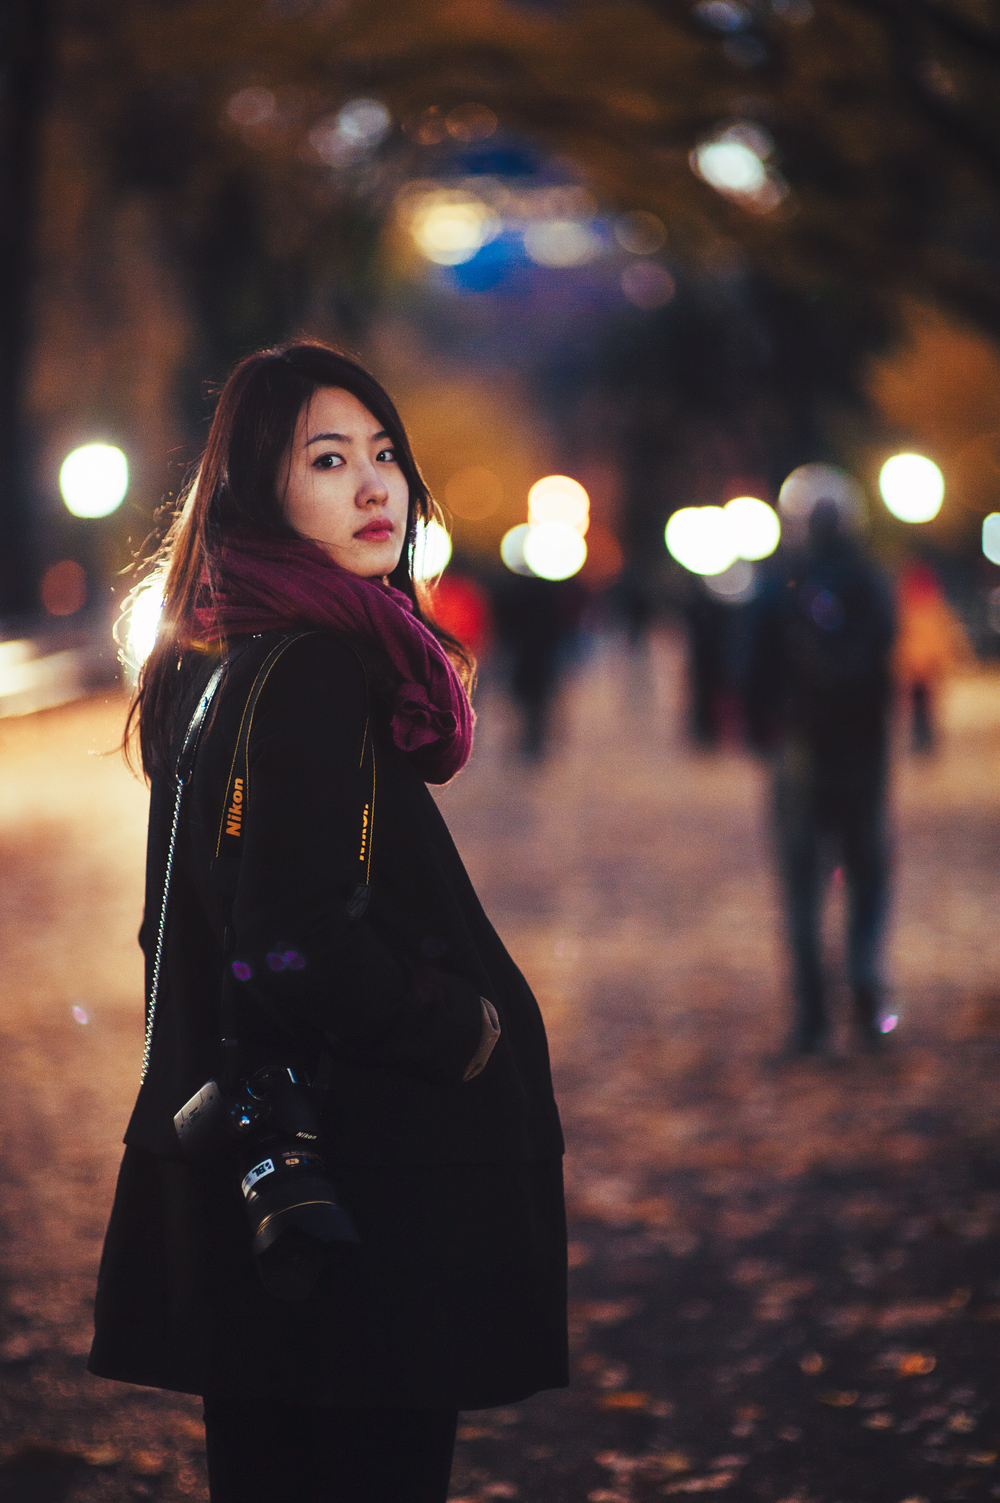 JYL_MINJISEO_CENTRALPARK-3.jpg